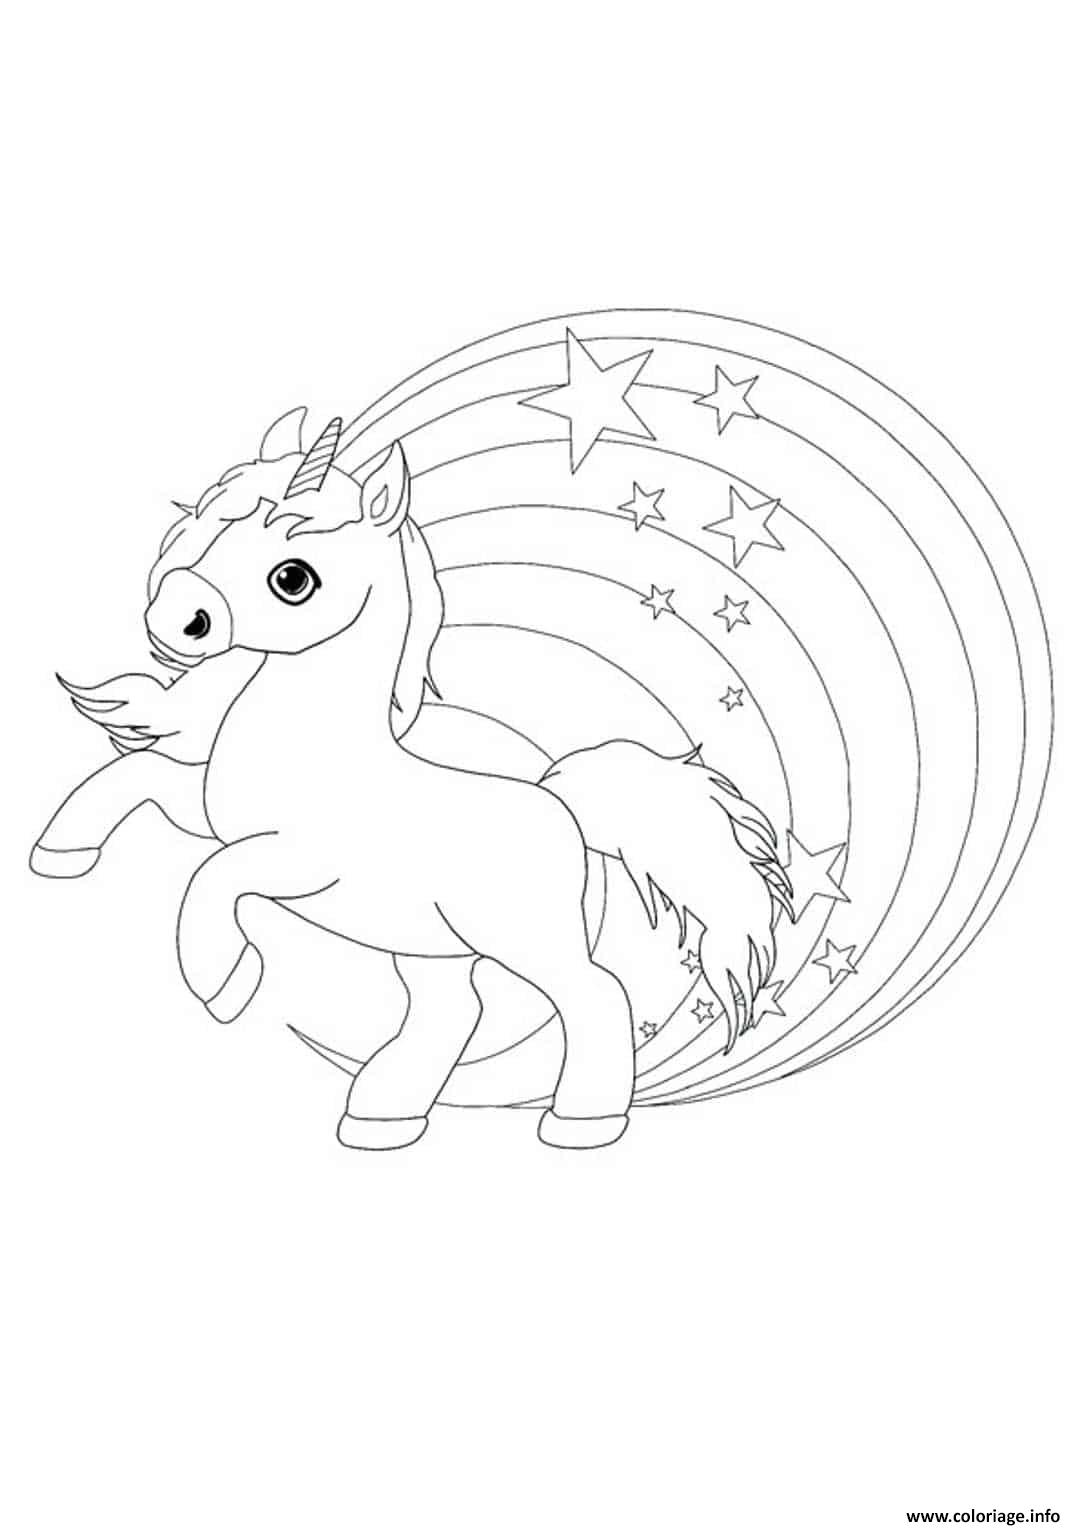 Coloriage Petit Licorne Mignon Arc En Ciel Dessin Licorne ...